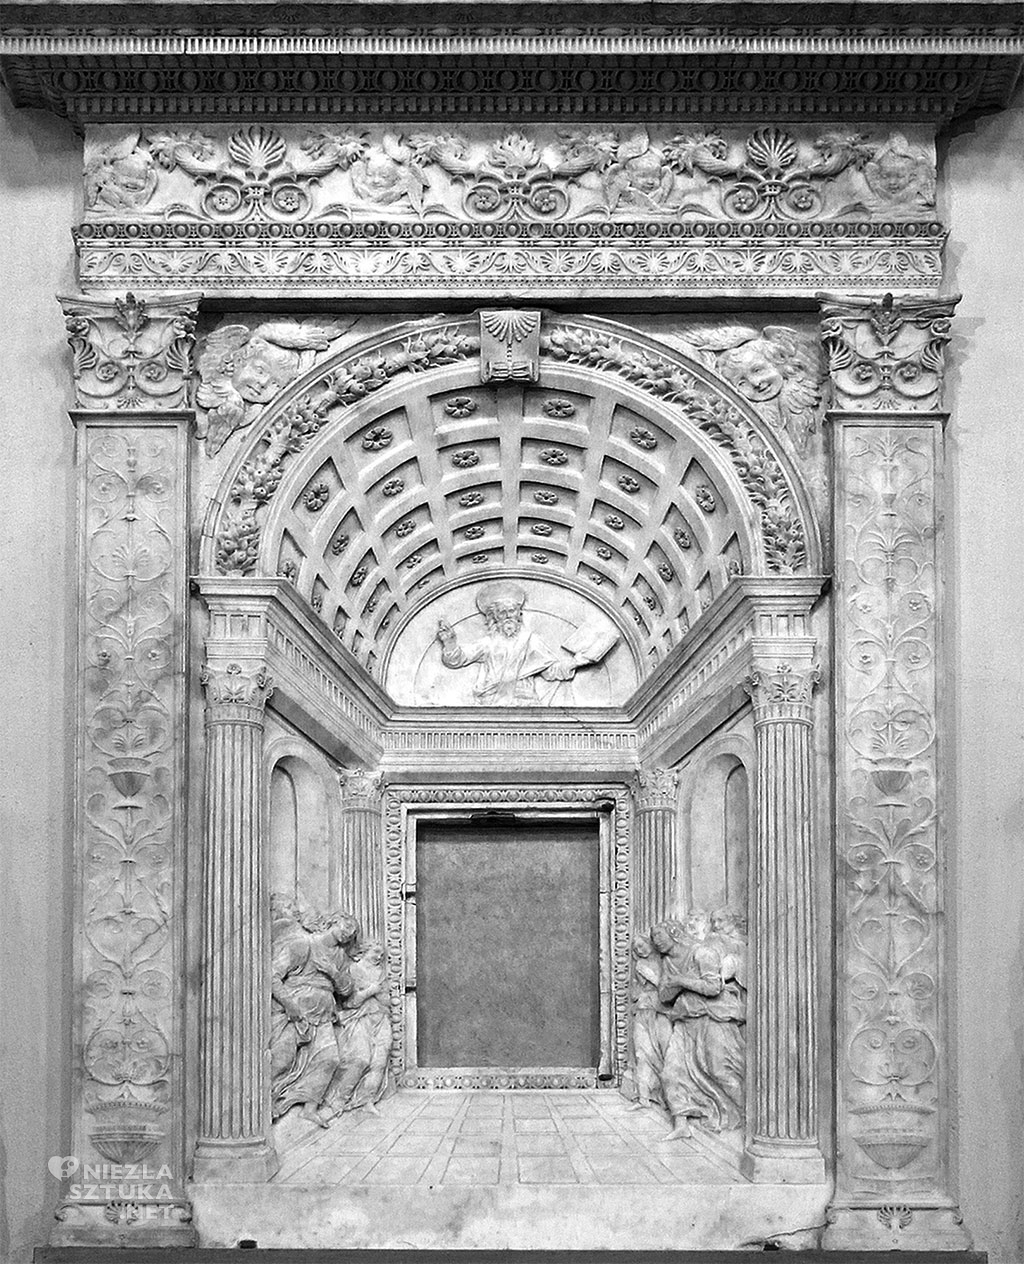 Desiderio da Settignano, Tabernaculum Św. Sakramentu, 1461, Bazylika San Lorenzo, Florencja, Niezła sztuka